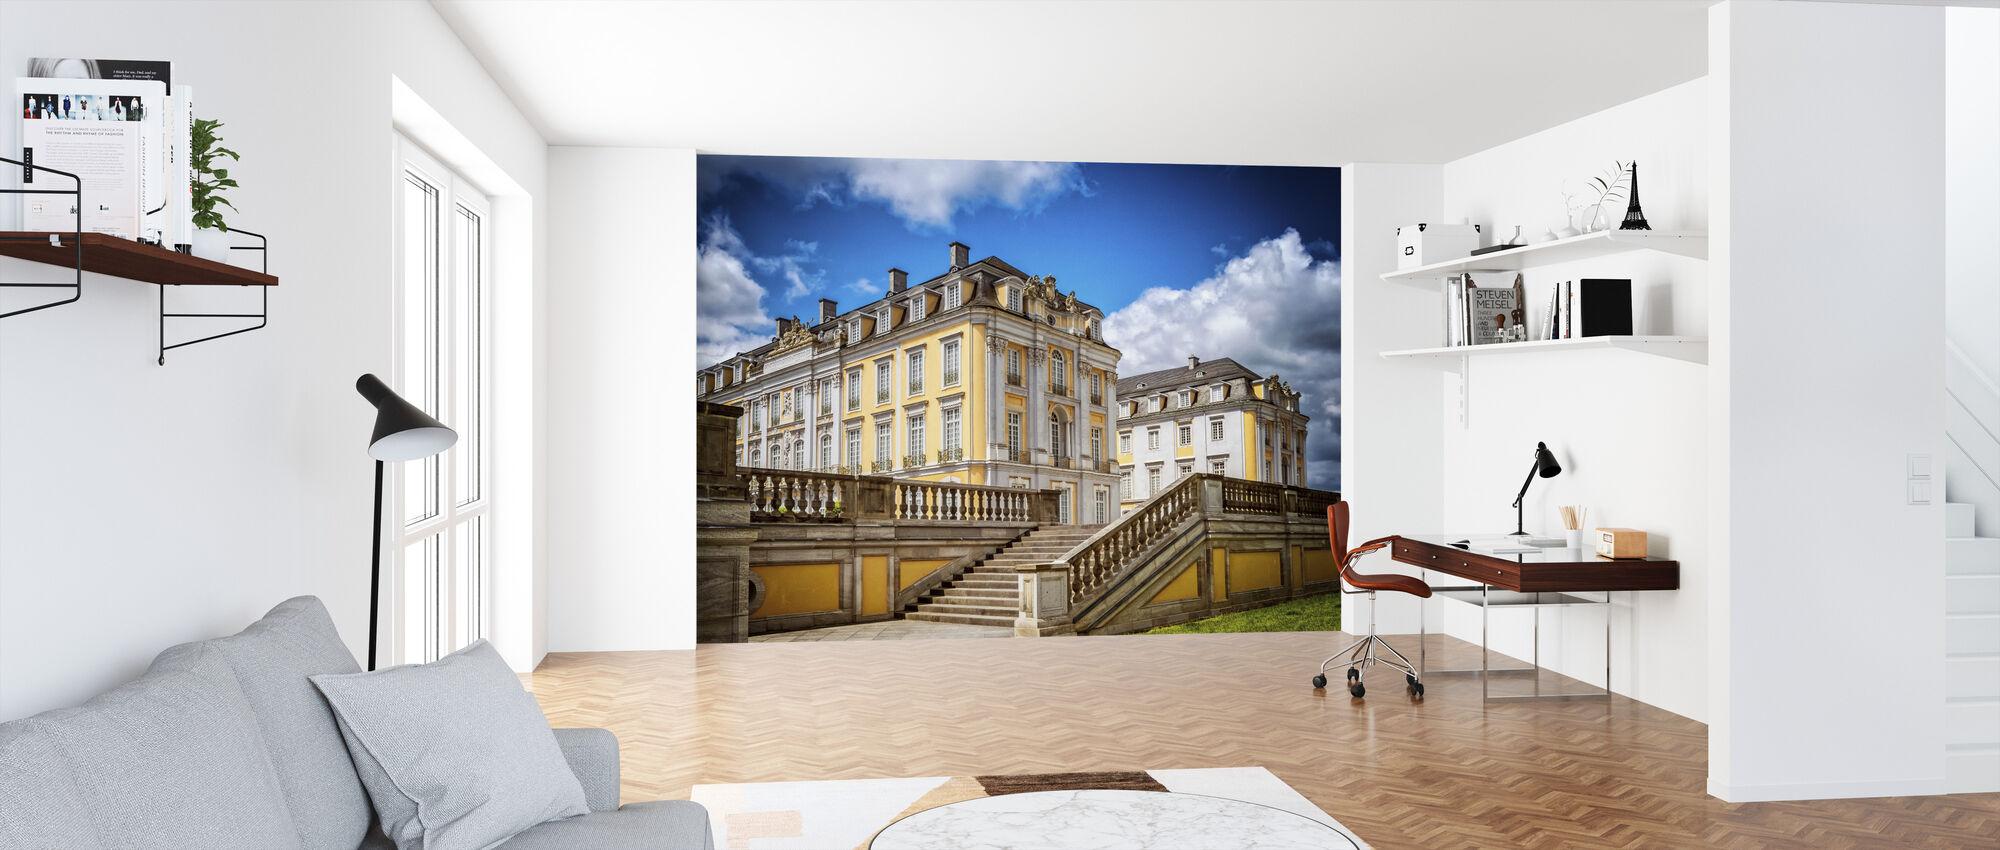 Baroque Castle - Wallpaper - Office